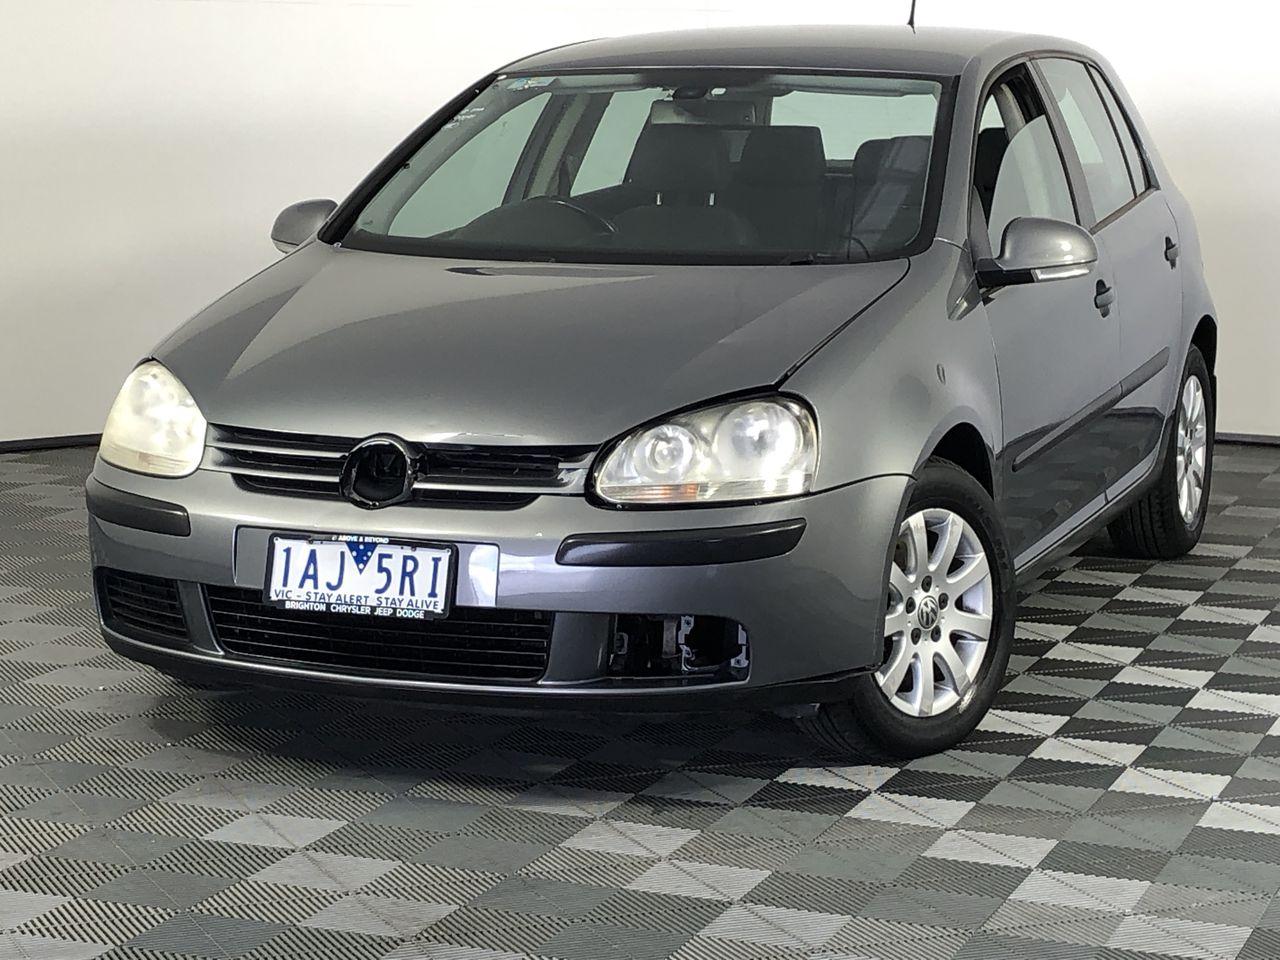 2006 Volkswagen Golf 1.9 TDI Comfortline 1k T/D Automatic Hatchback